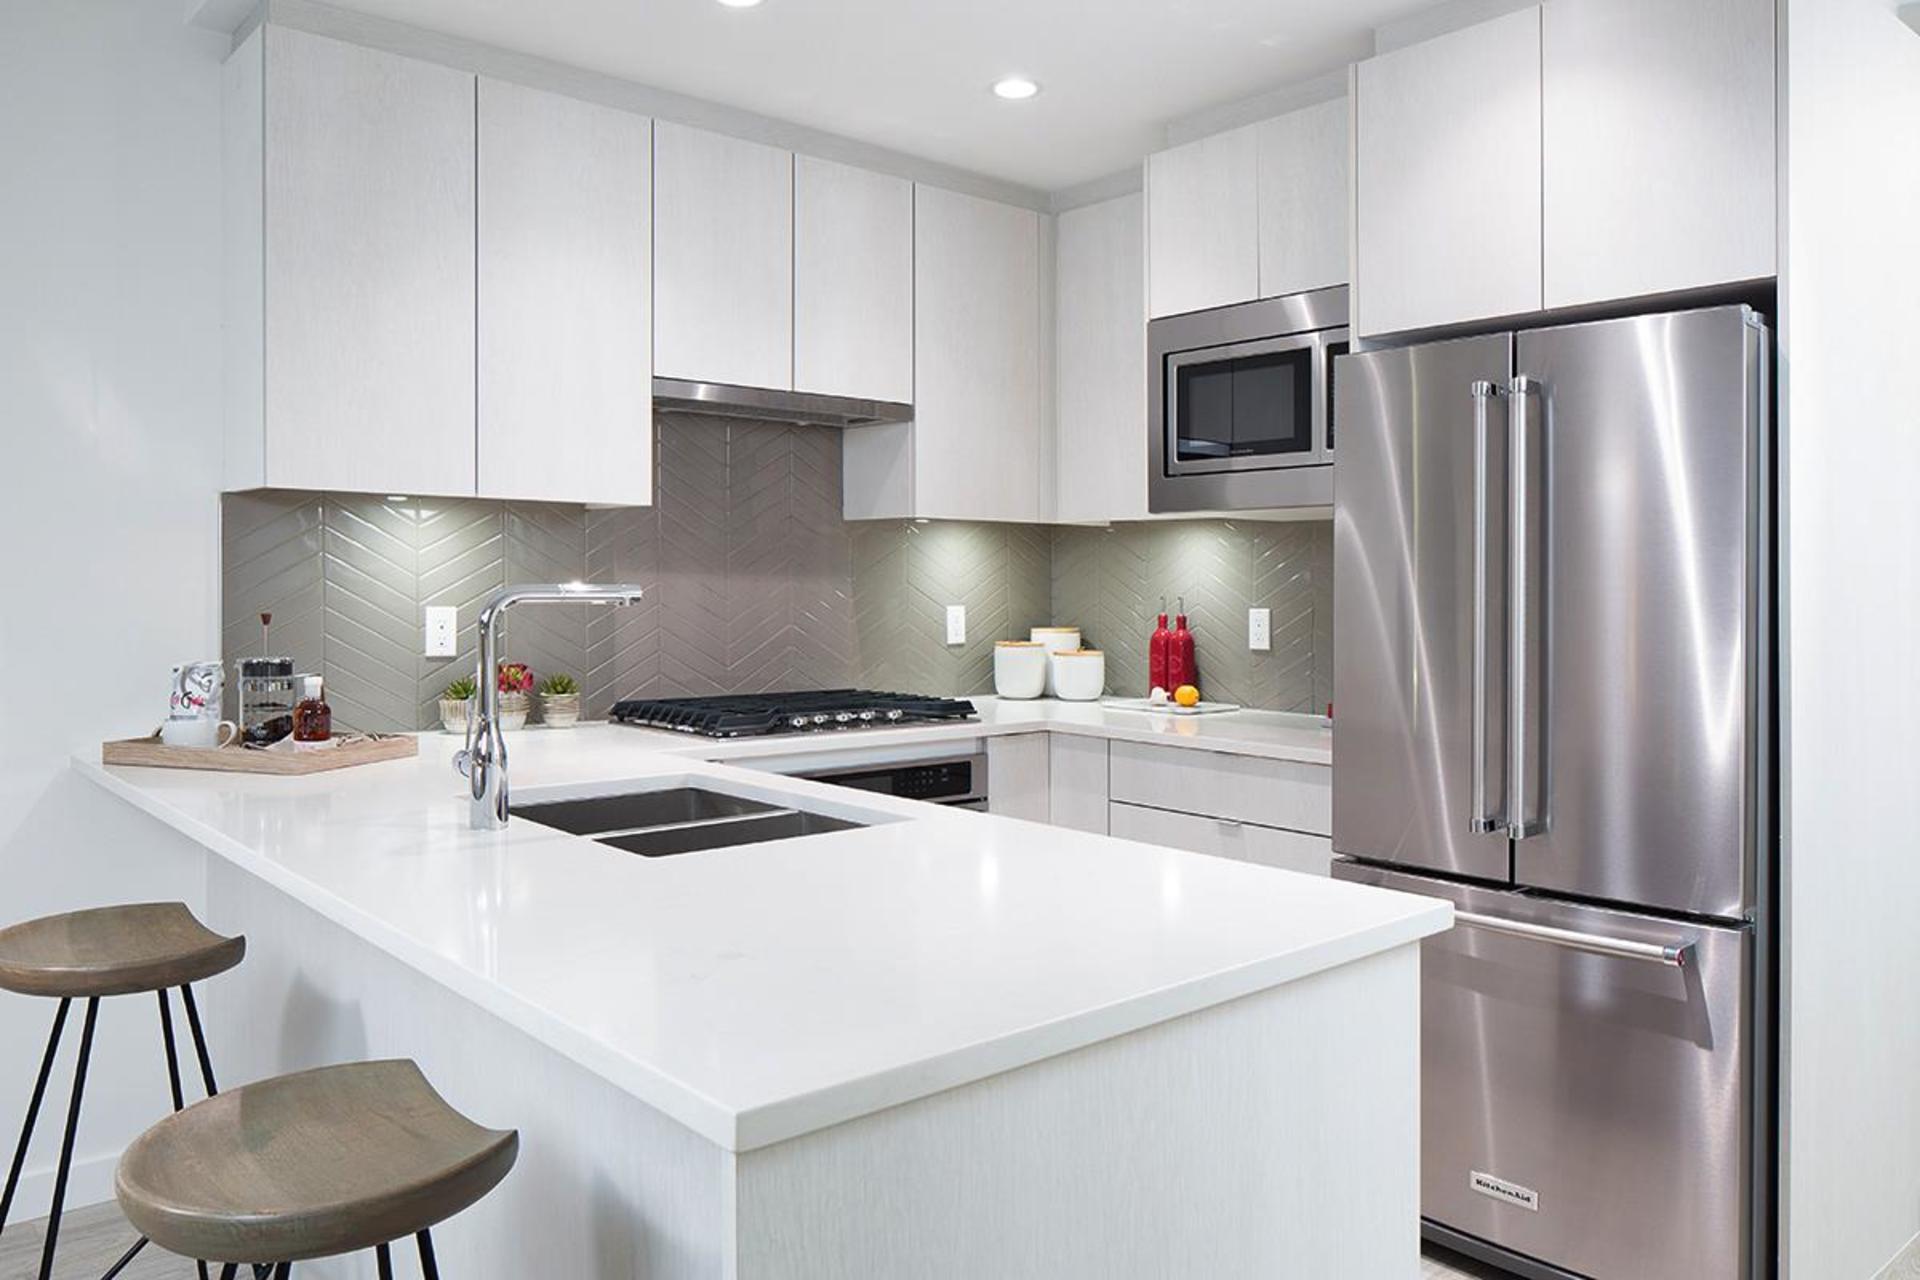 Kitchen design concept for Simon2 by Otivo.